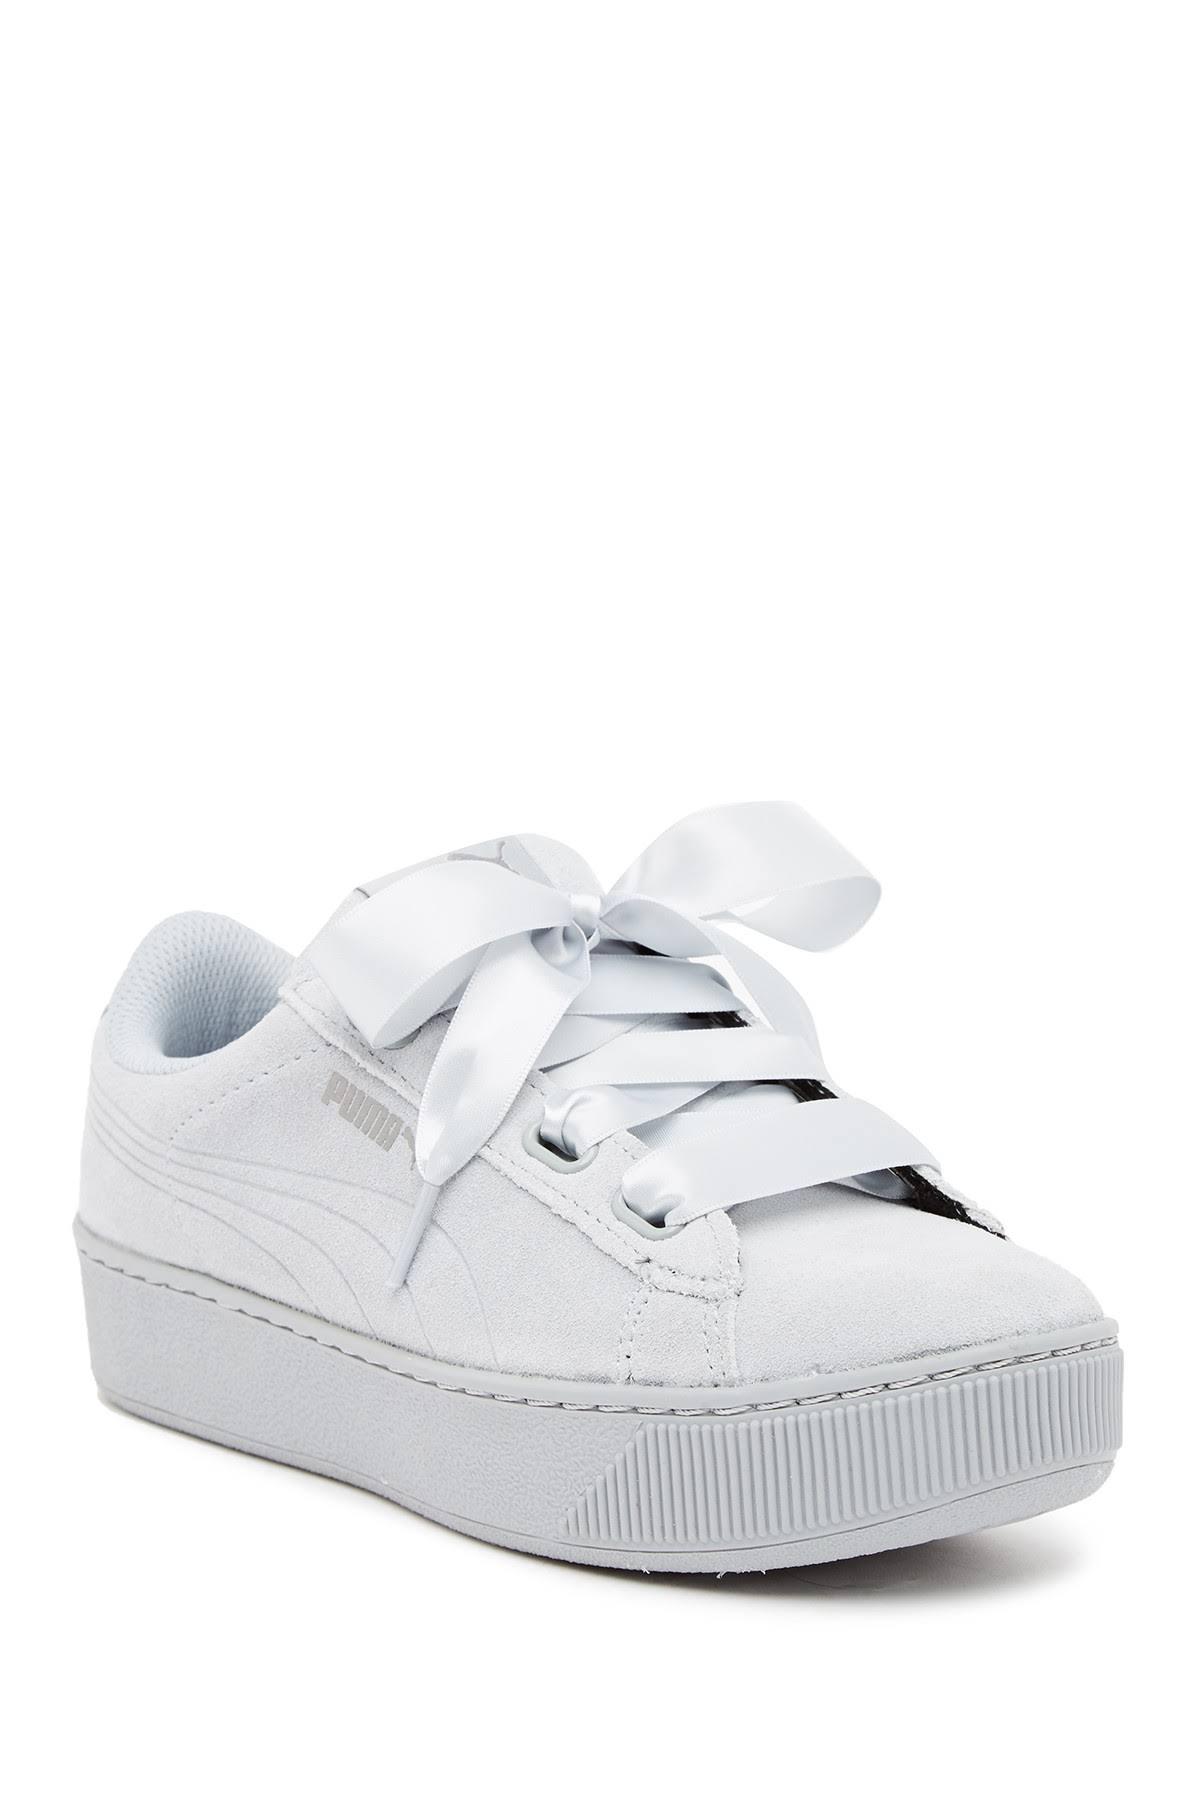 Damski Women Sneaker Vikky Puma szary Platform wx7CHwqg